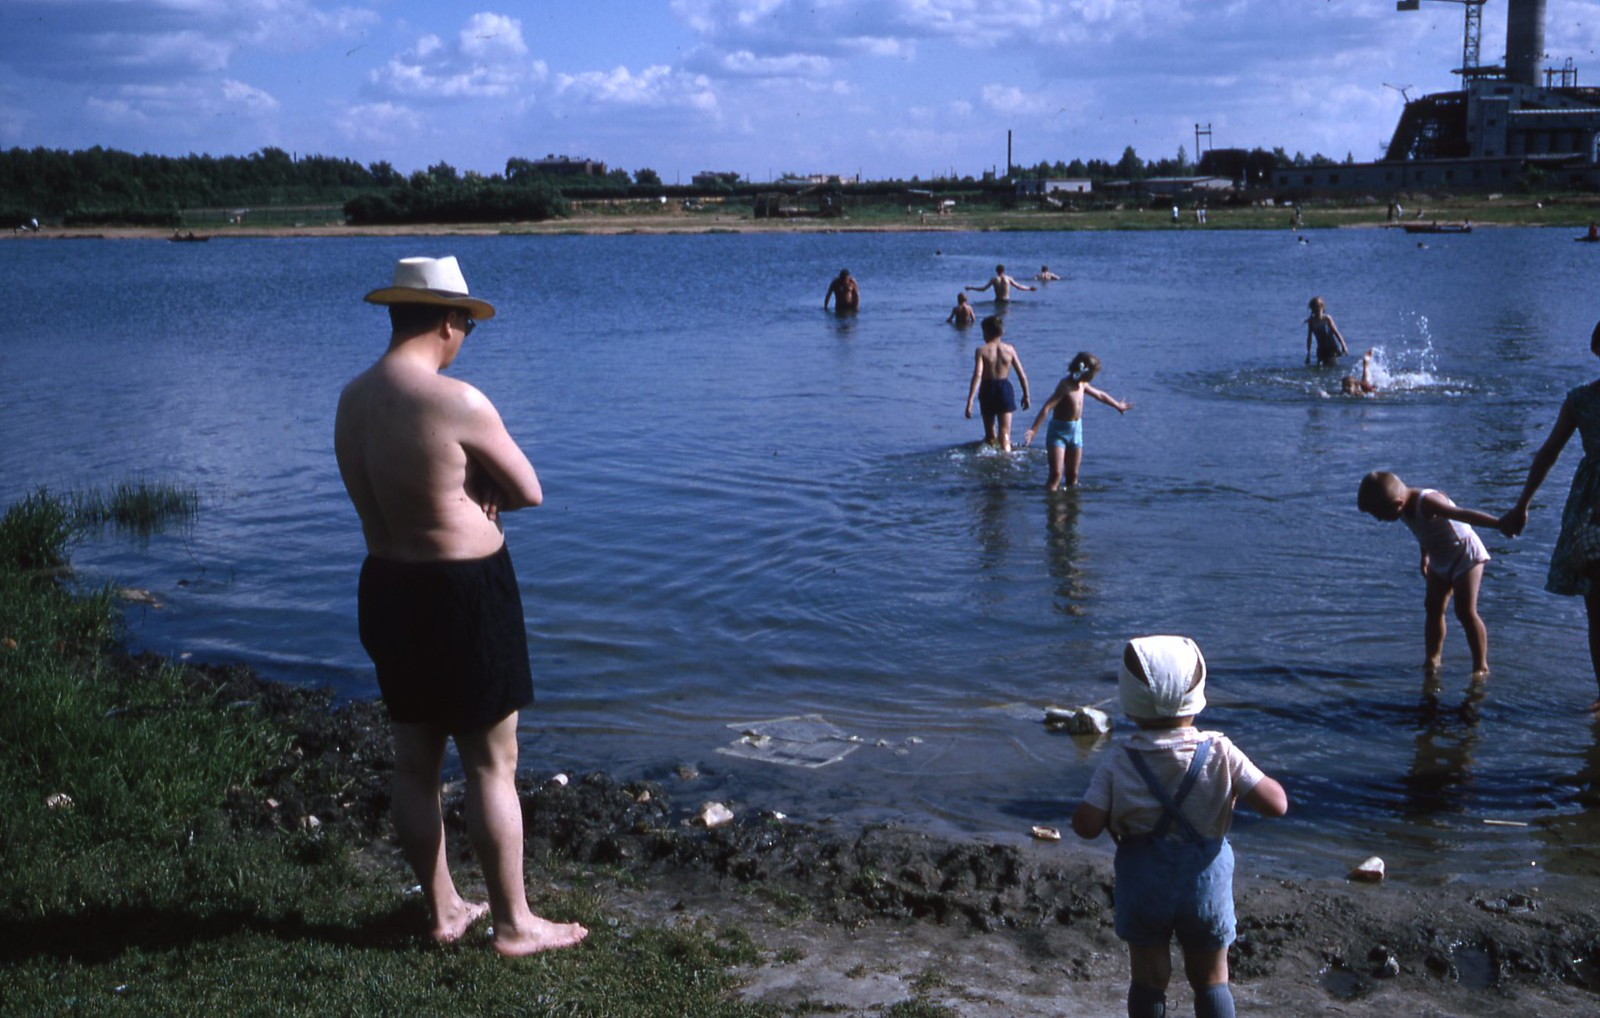 hammond-MA10-Ostankino-people-sunbathing-and-fishing-001